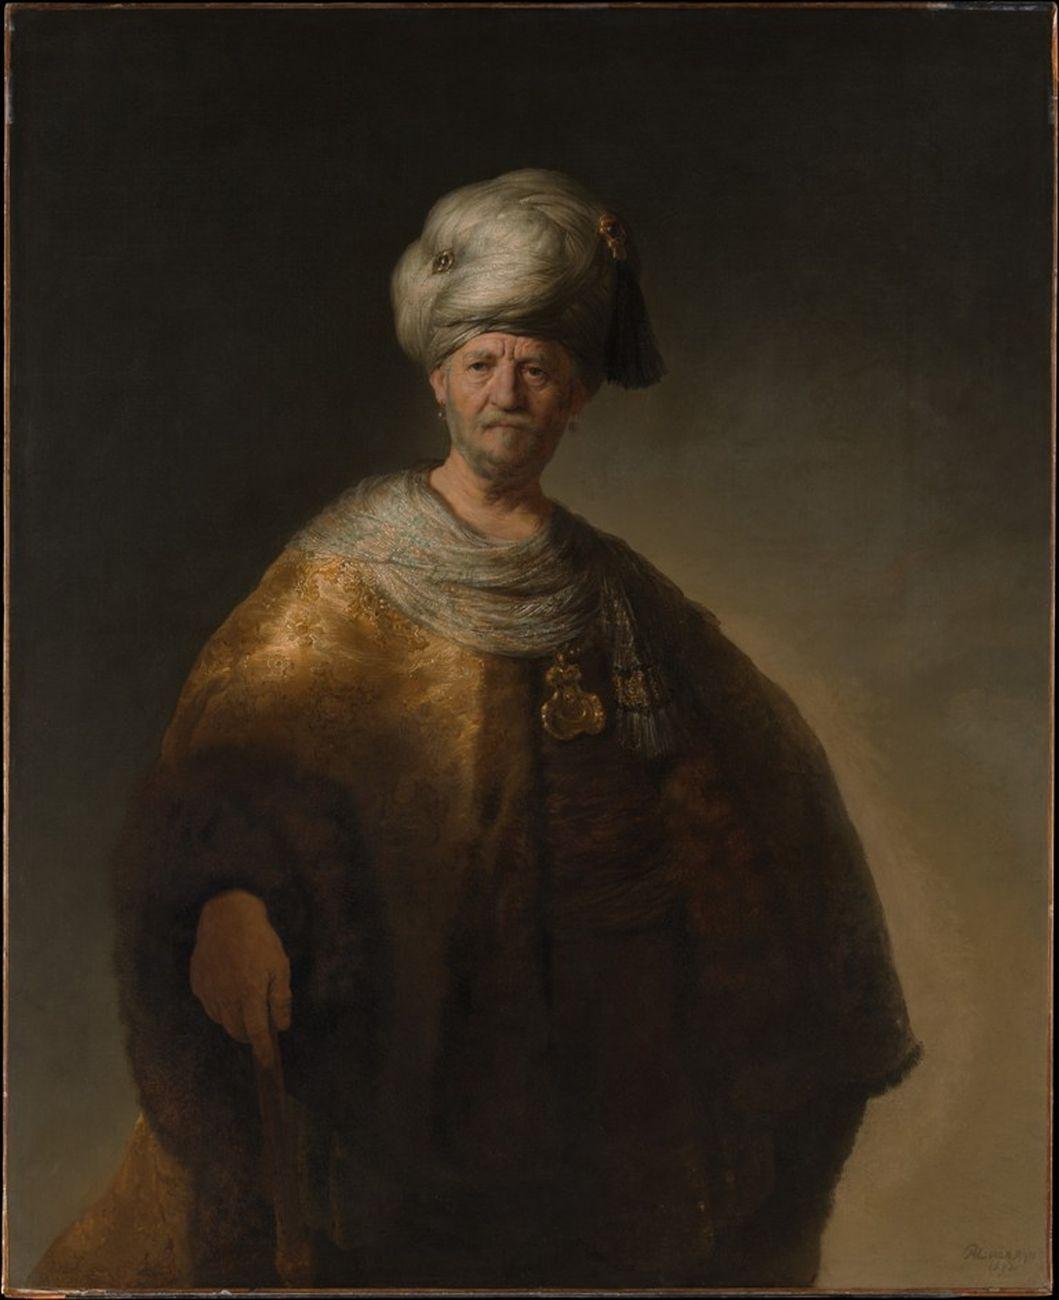 Rembrandt, Uomo in costume orientale, 1632. New York, The Metropolitan Museum of Art